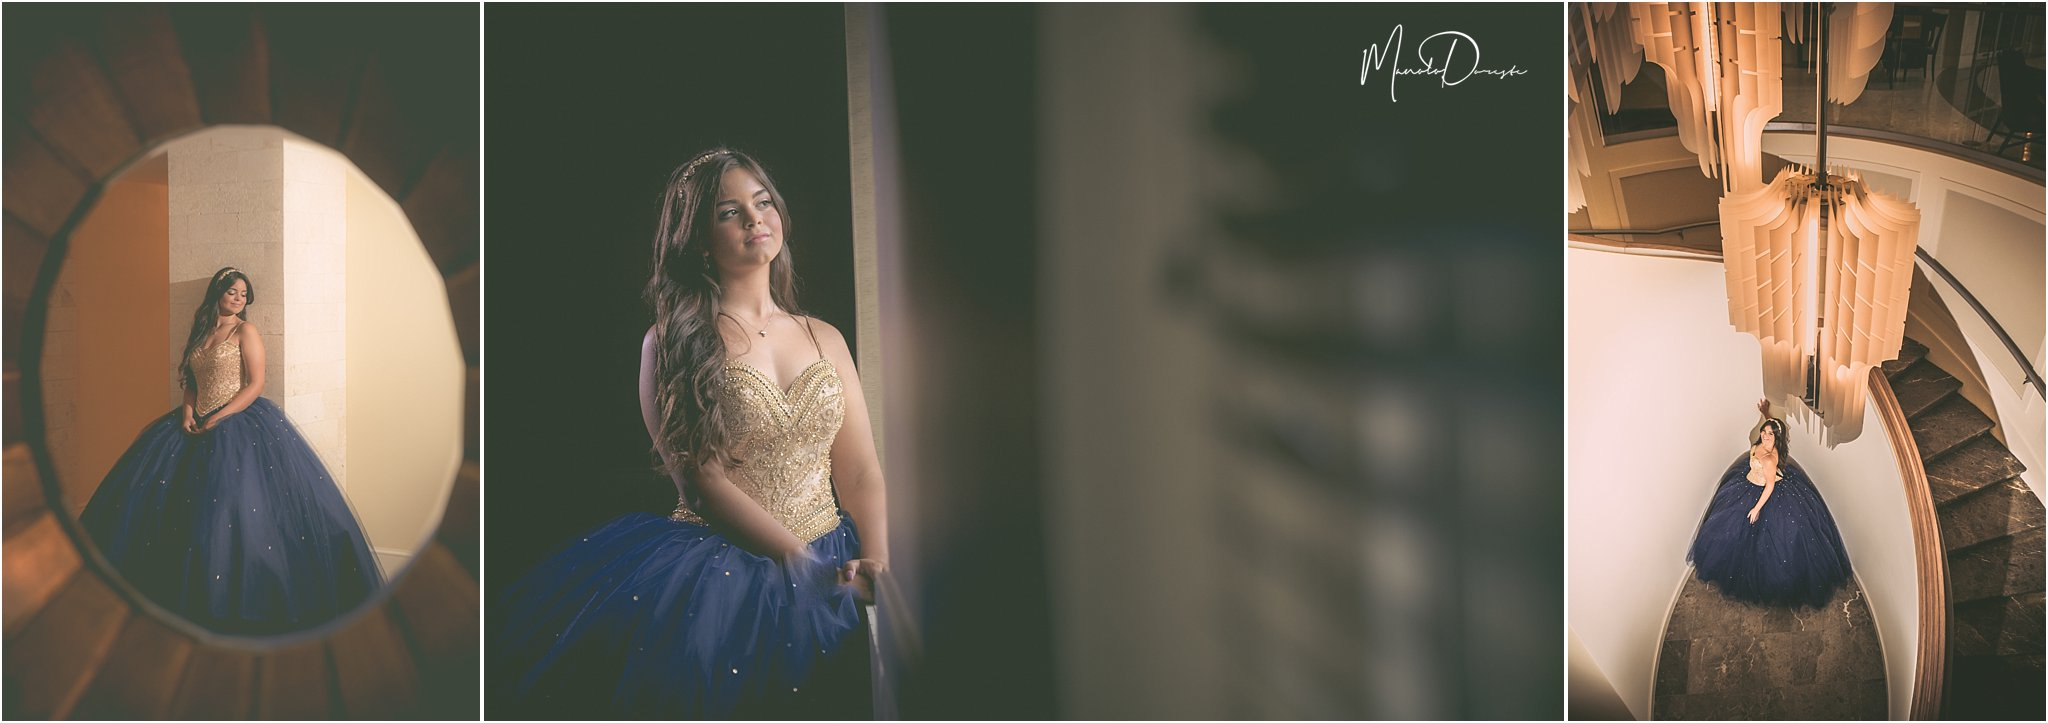 0281_ManoloDoreste_InFocusStudios_Wedding_Family_Photography_Miami_MiamiPhotographer.jpg